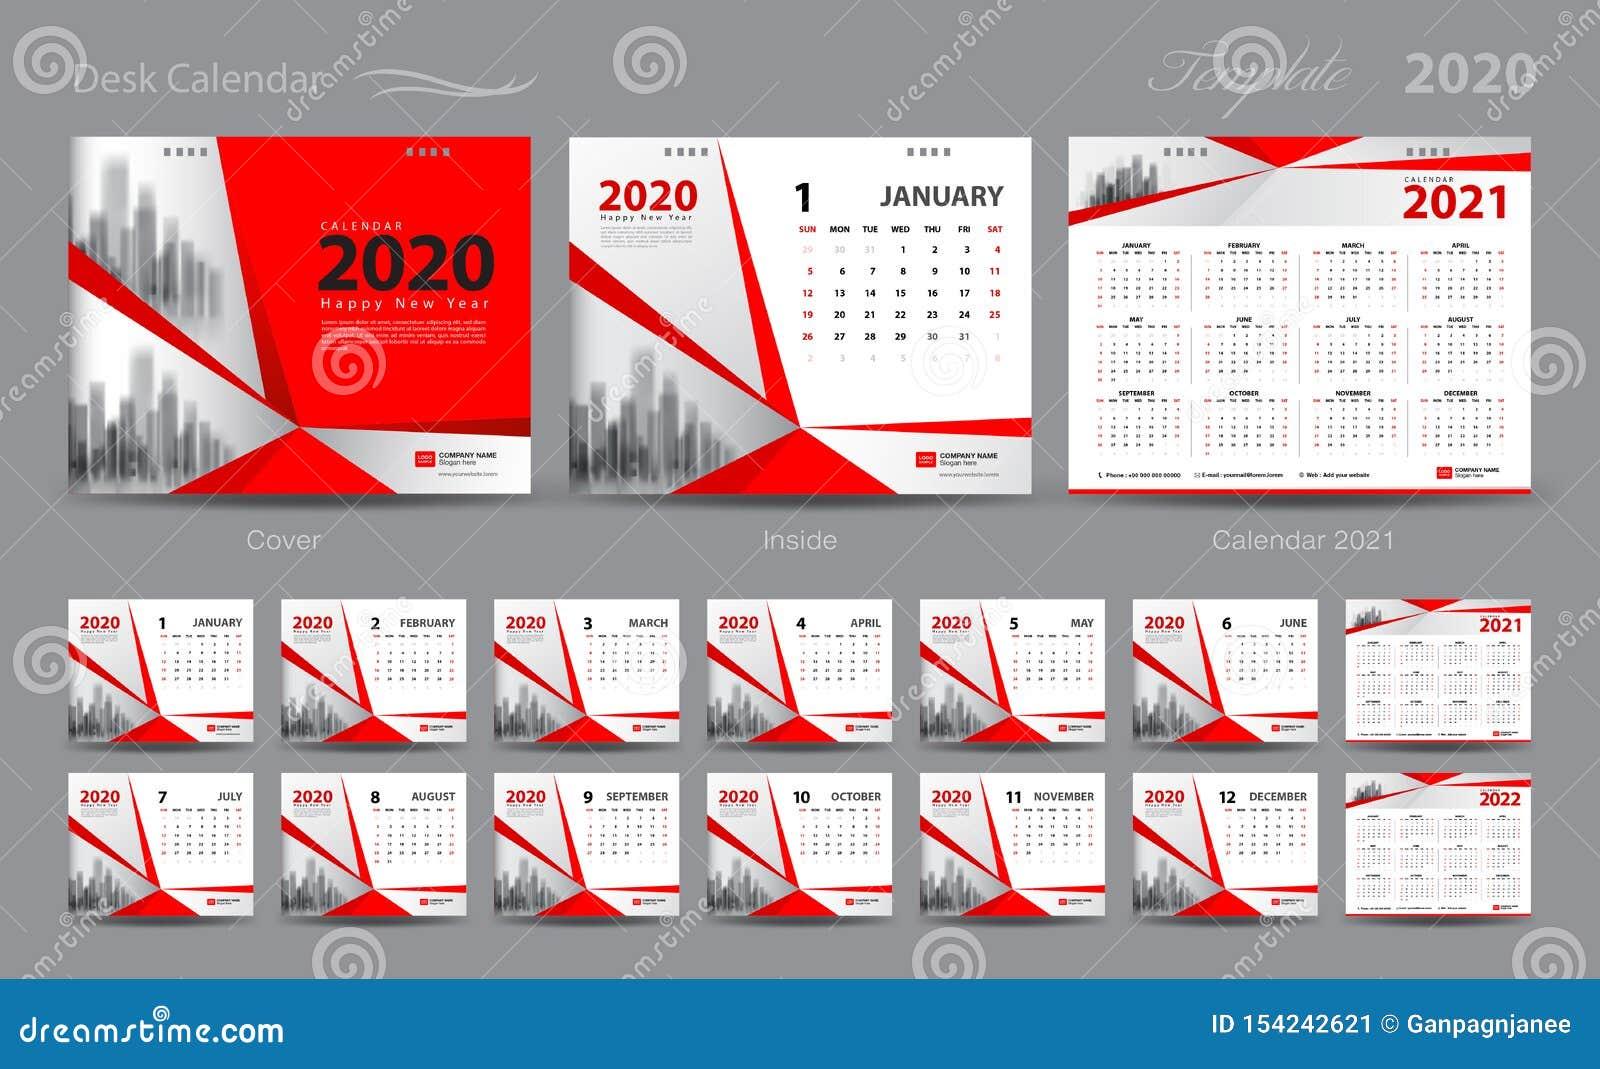 Desk Calendar 2021-2022 Set Desk Calendar 2020 Template Vector, Calendar 2021 2022, Cover